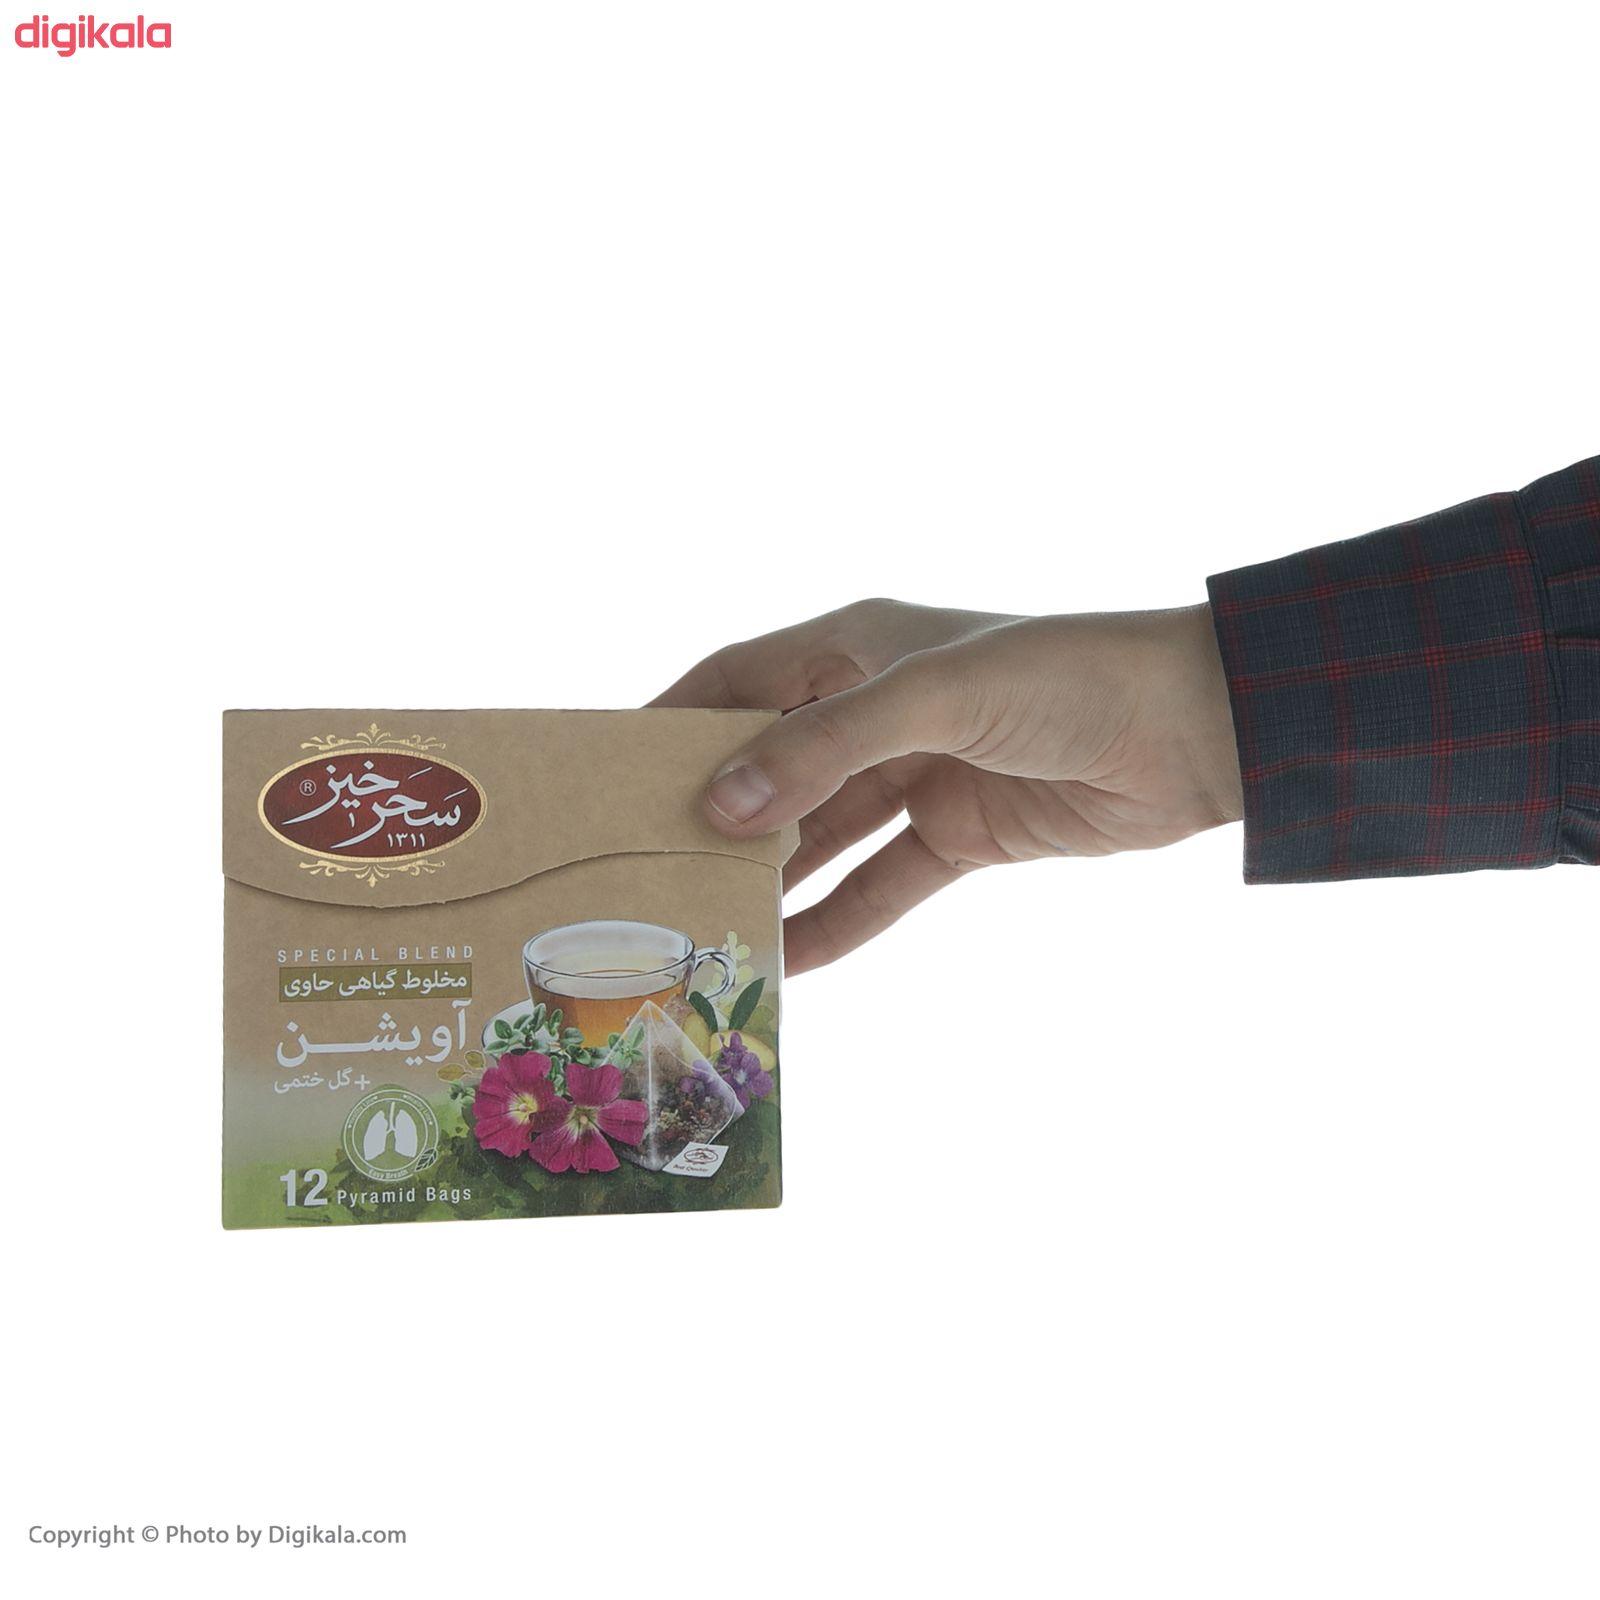 دمنوش مخلوط گیاهی آویشن و گل ختمی سحر خیز - بسته 12 عددی main 1 6